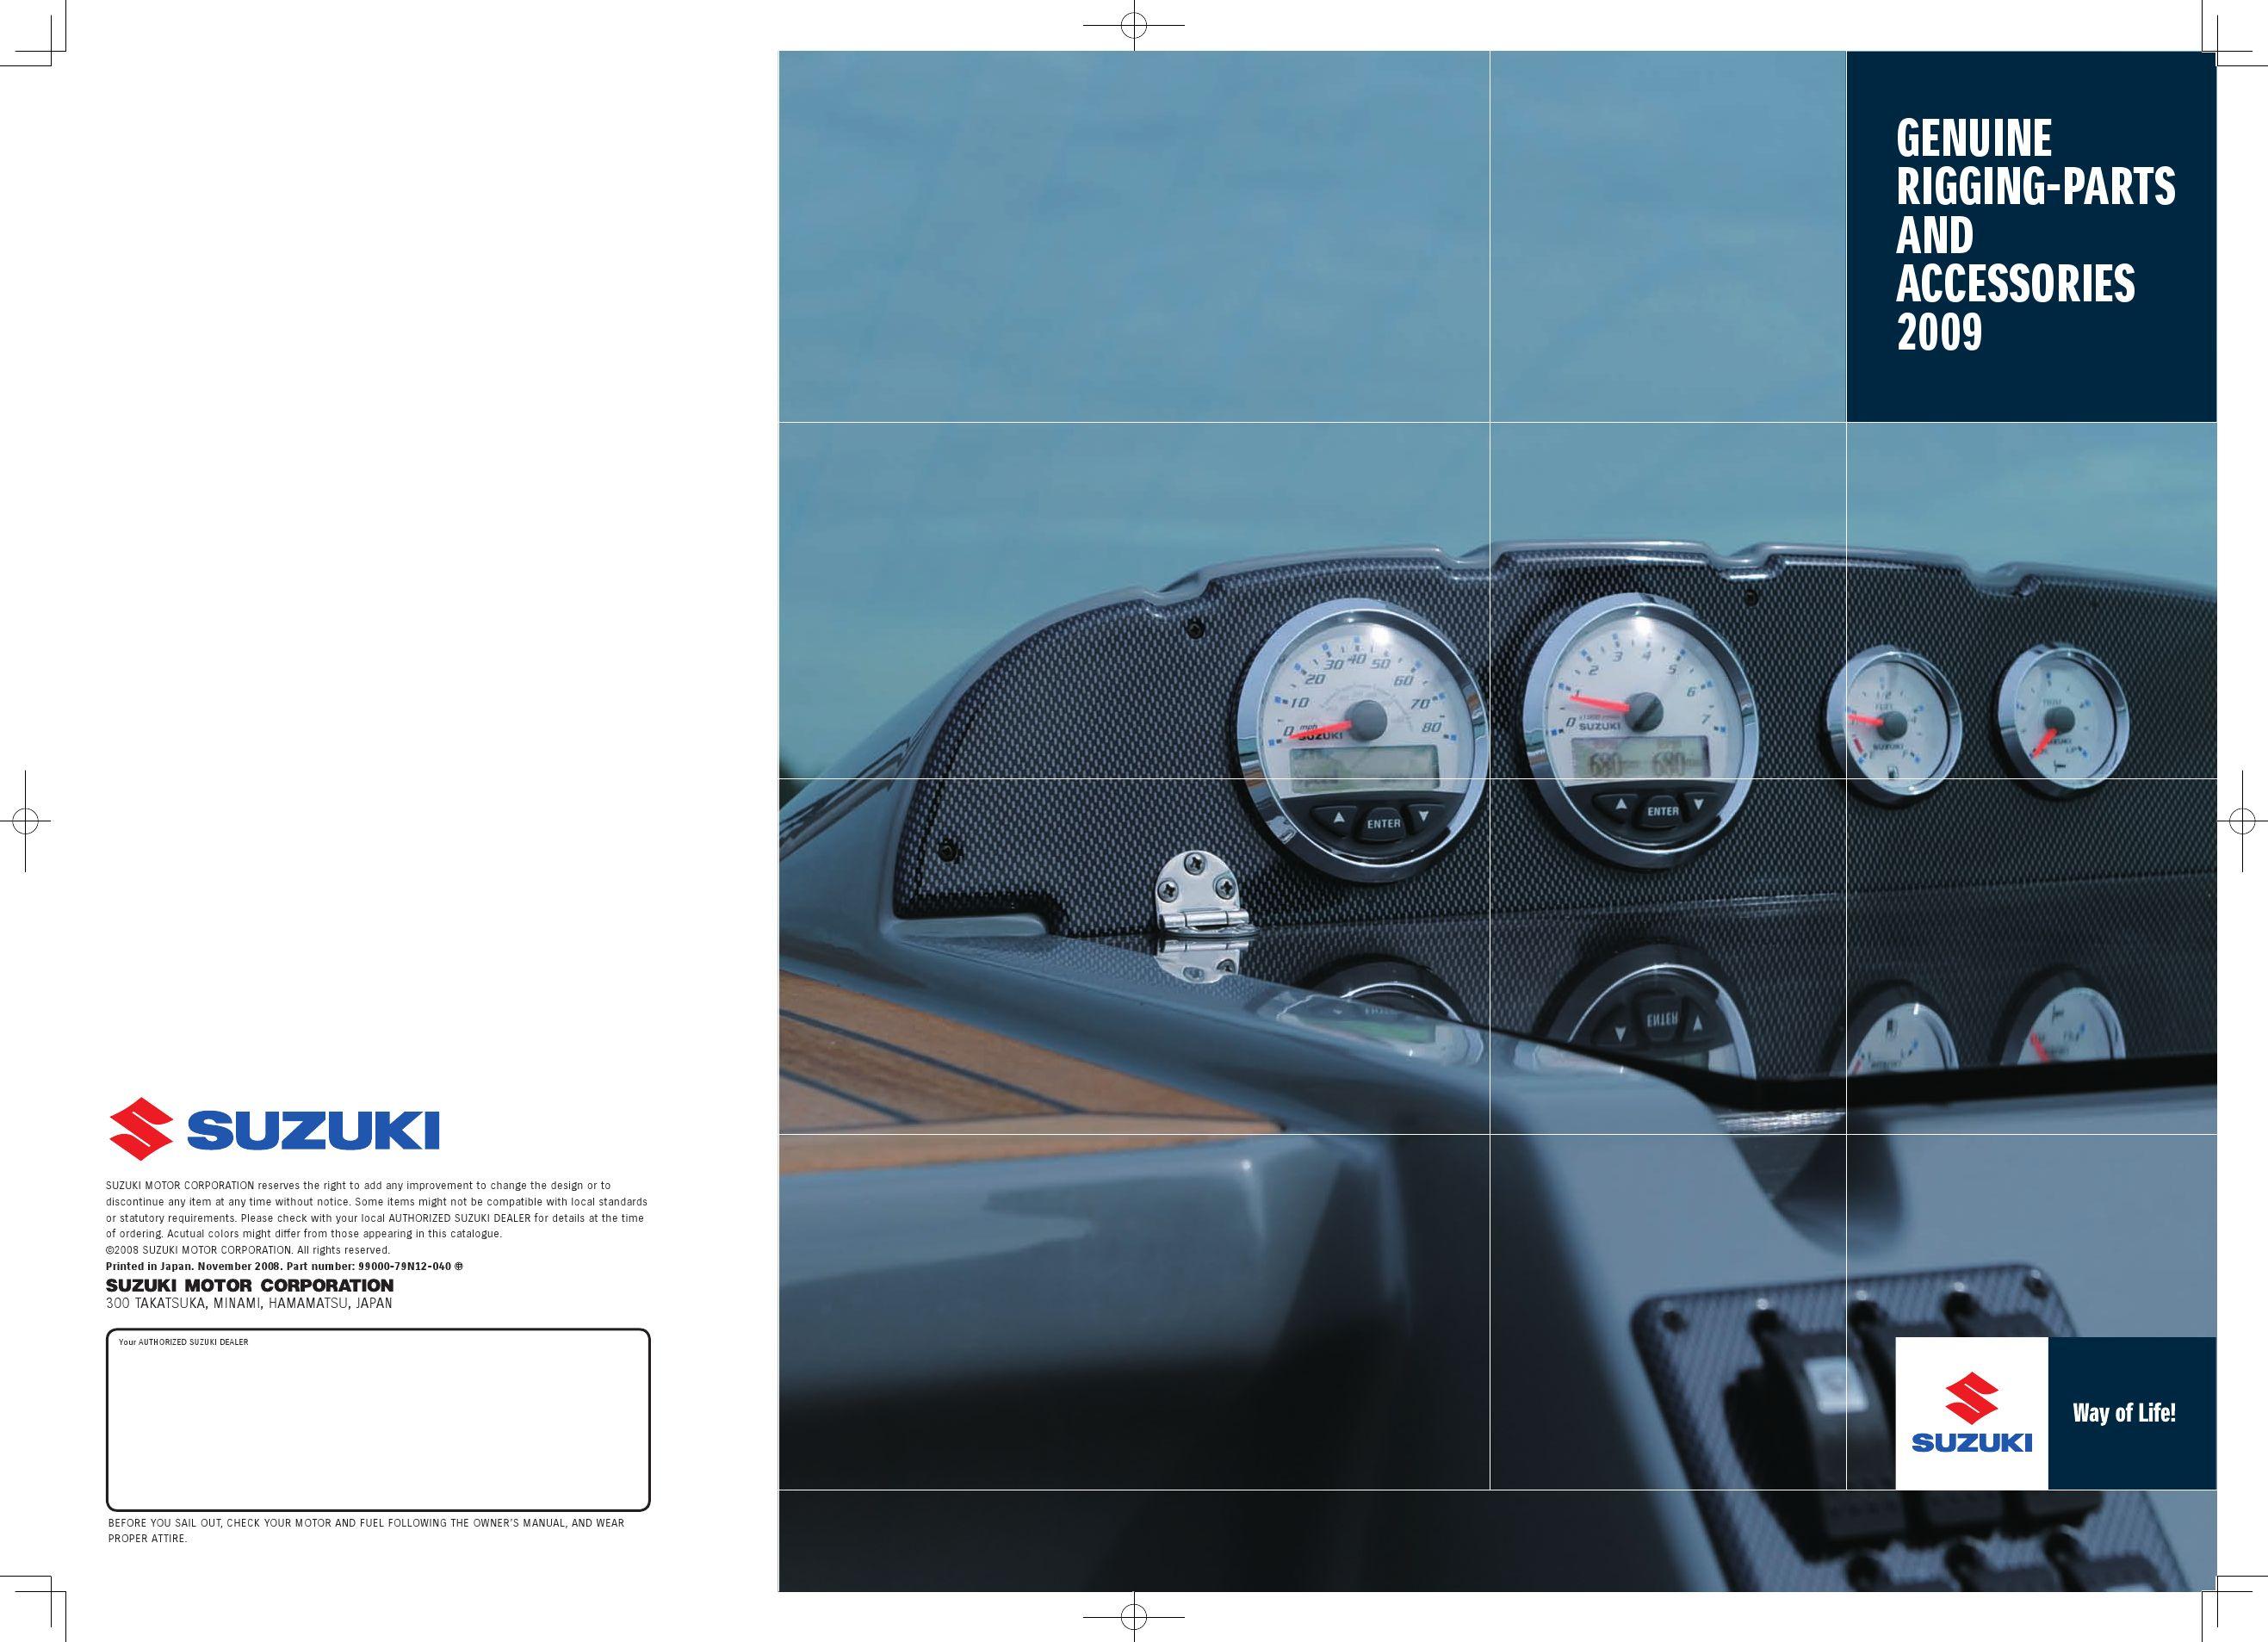 PART NUMBER 09204-02001 GENUINE SUZUKI OUTBOARD MOTOR PROPELLER SPLIT PIN